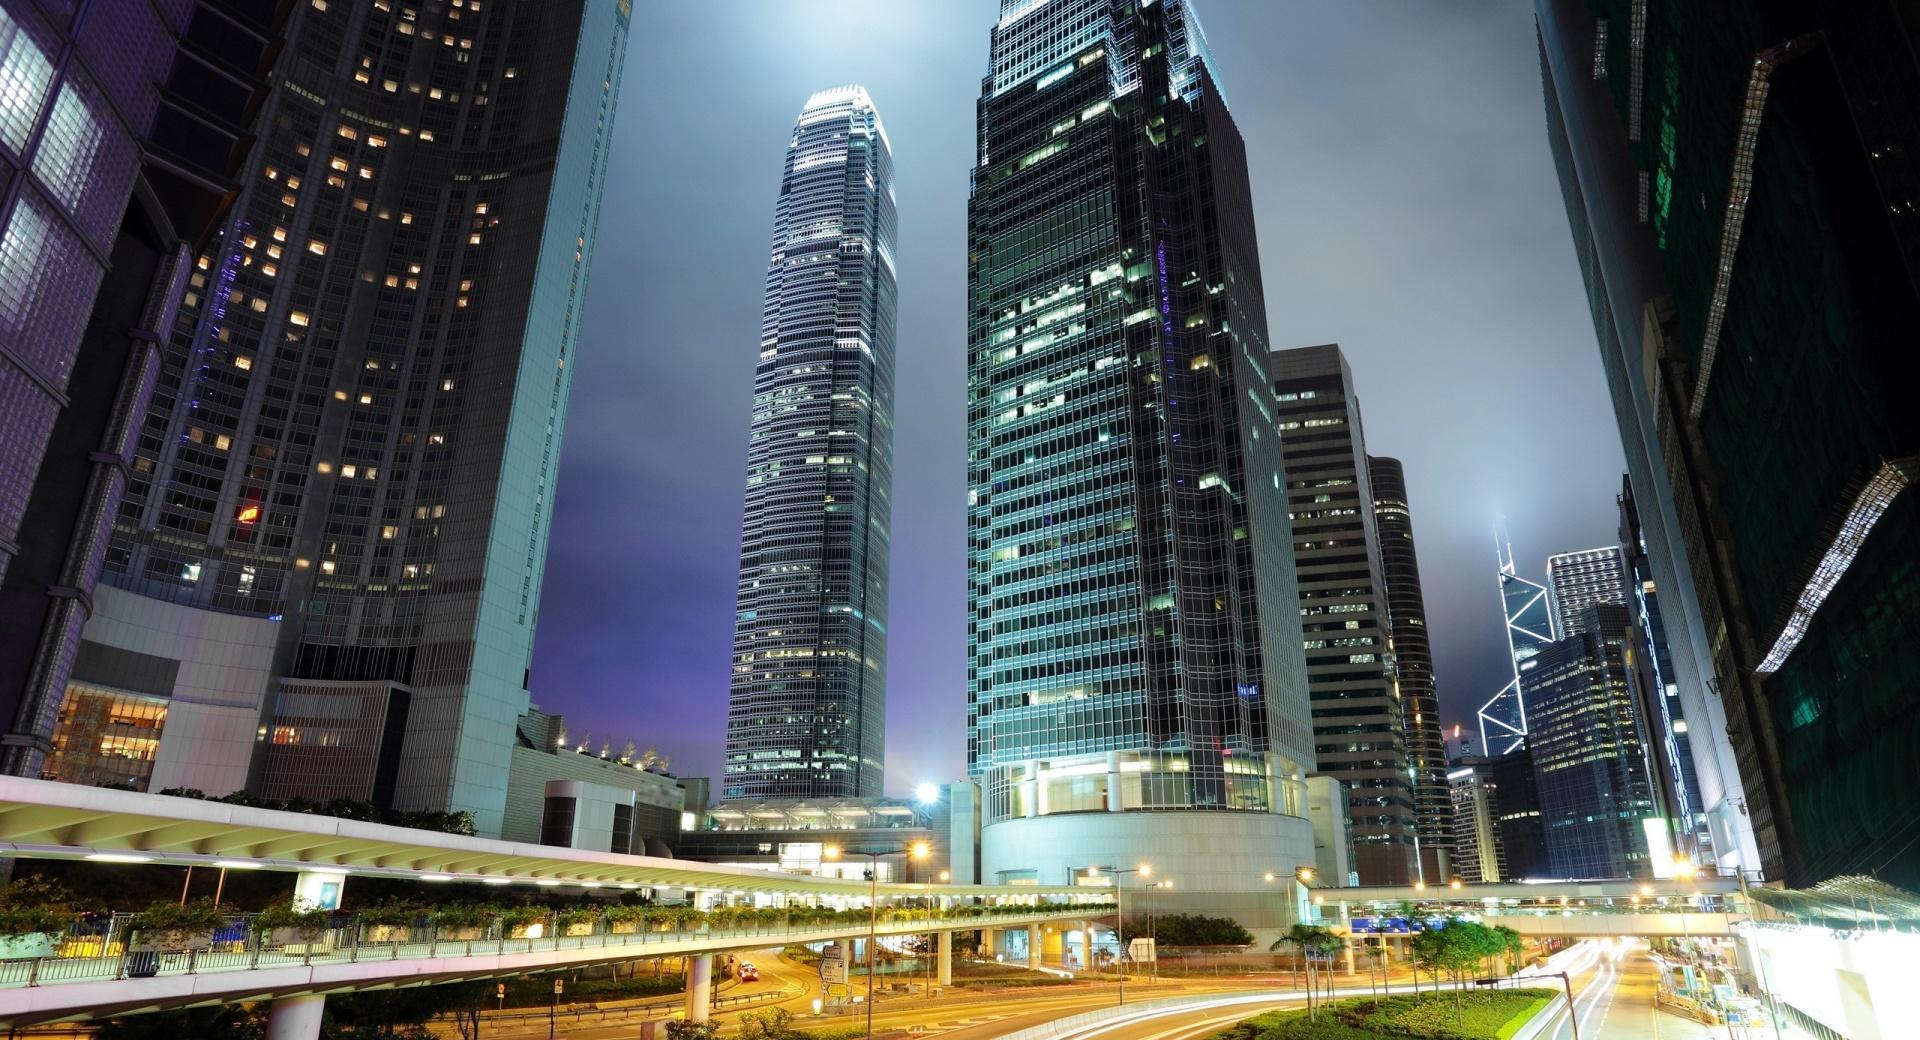 Hong Kong Downtown Night Lights wallpapers HD quality